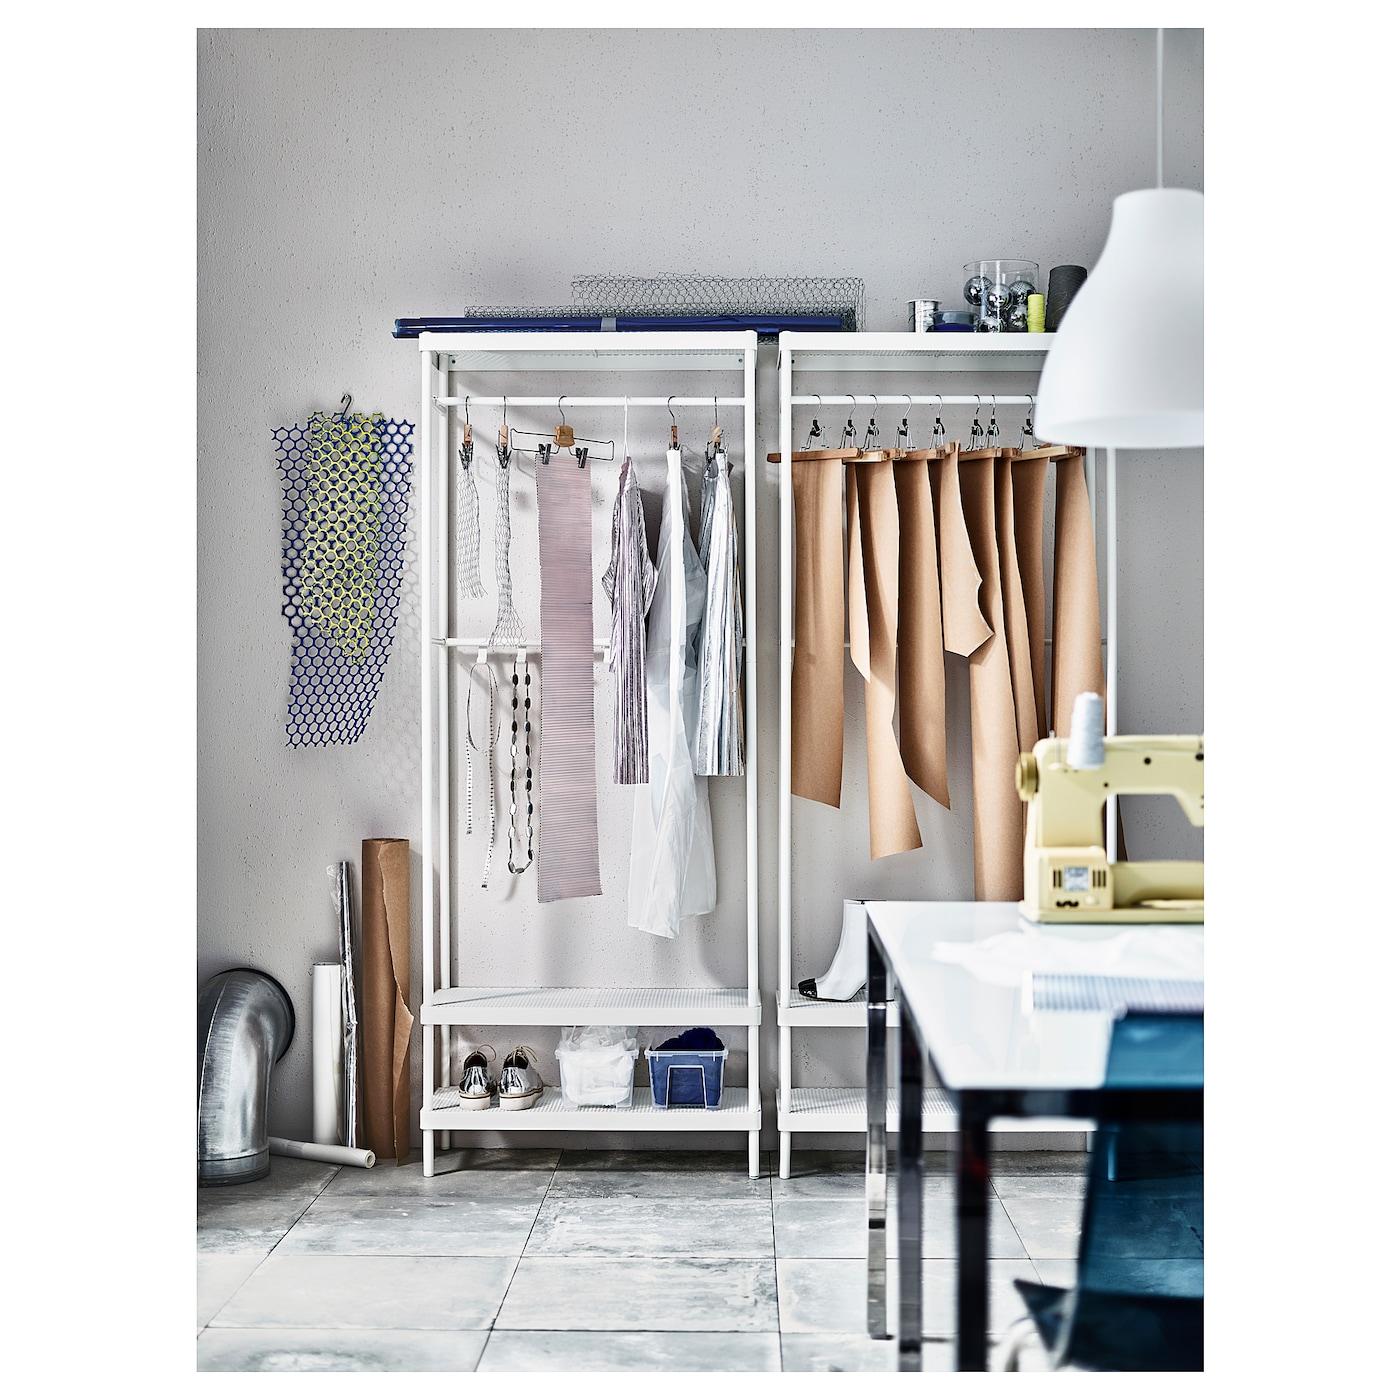 IKEA MACKAPÄR Coat Rack With Shoe Storage Unit